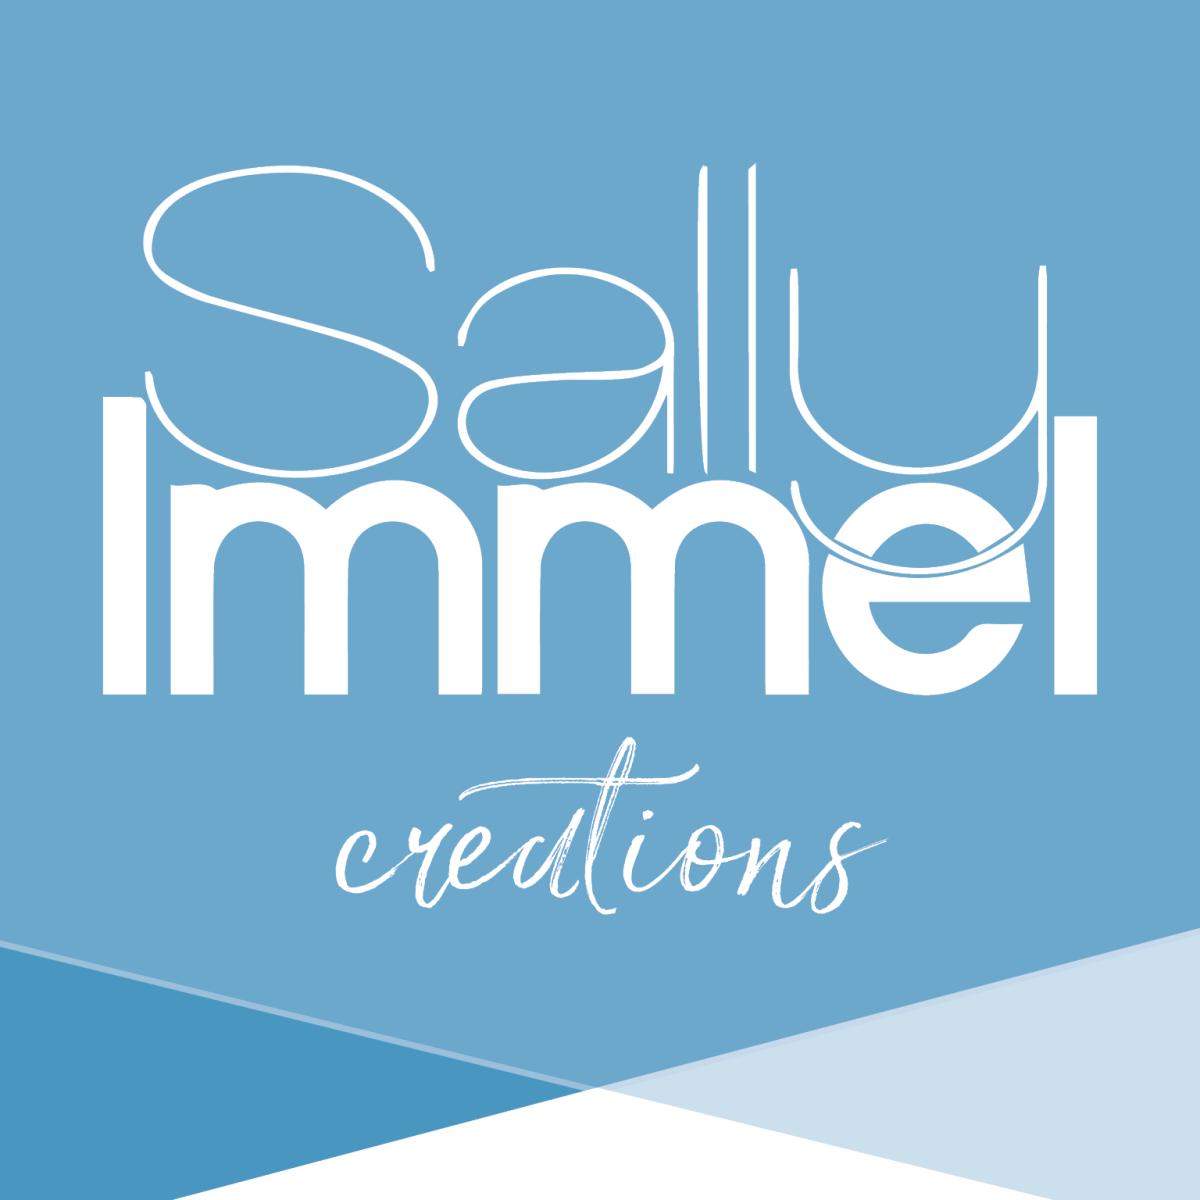 Sally: Graphic Designer, Sally iCreations